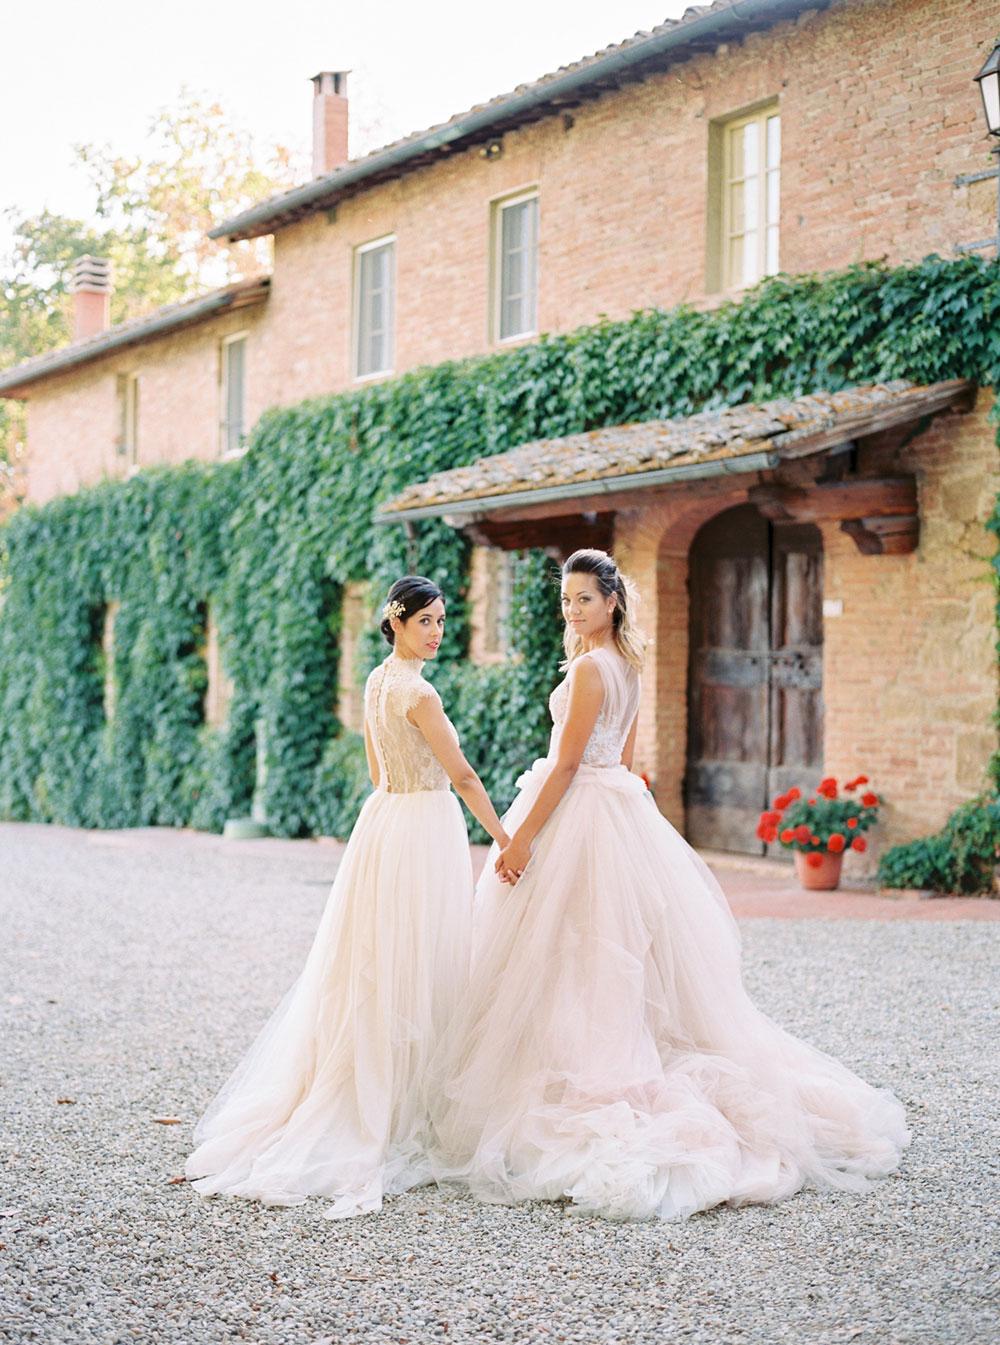 Linari-Tuscany-Elopement-Courtney-Michaela-147